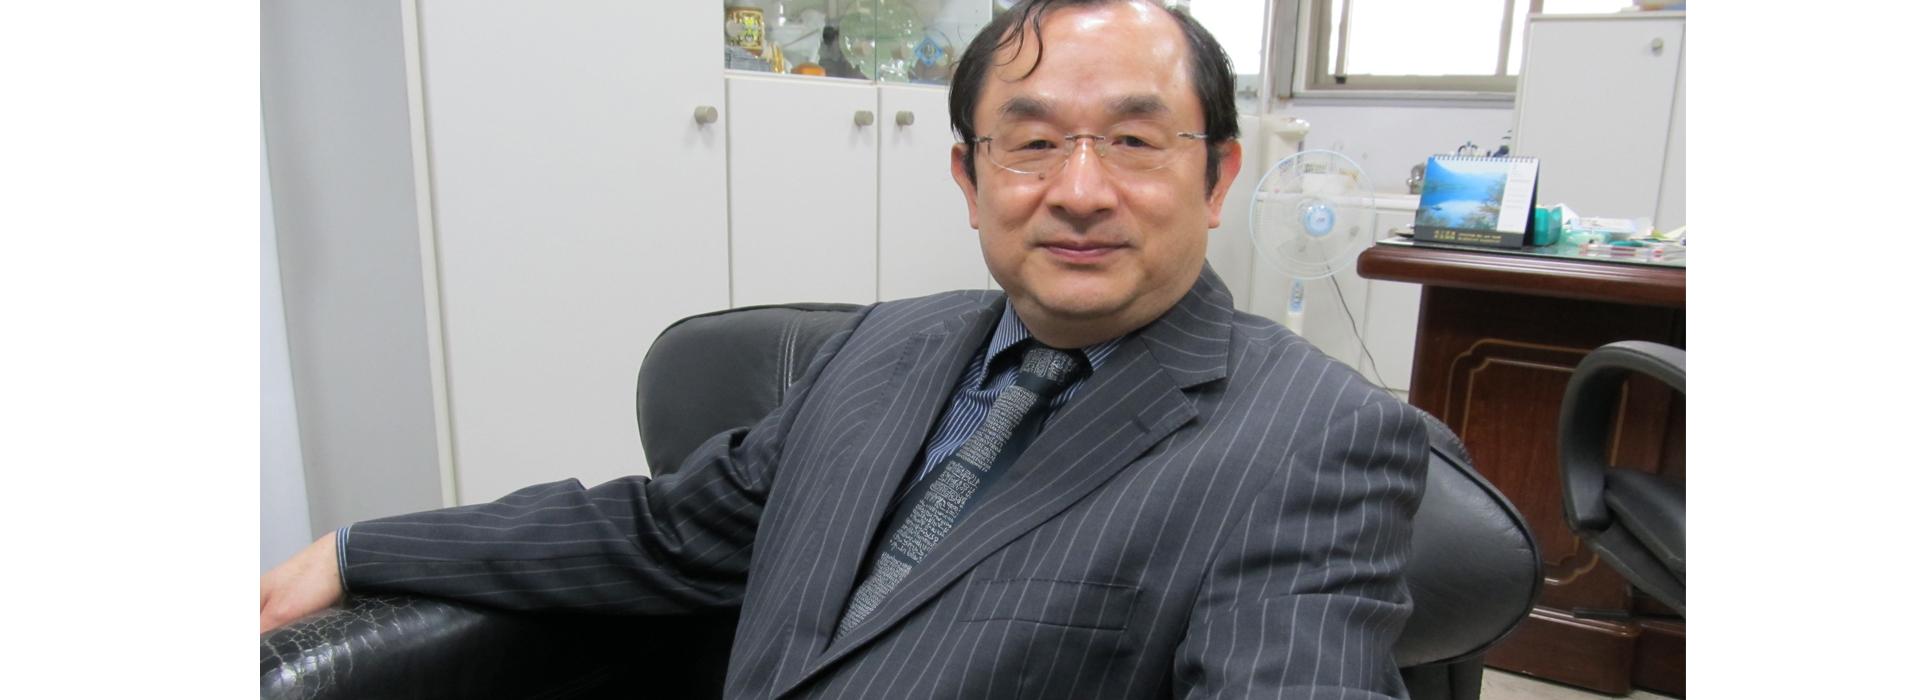 3D列印協會理事長鄭正元—3D列印同時帶動製造升級與創客運動